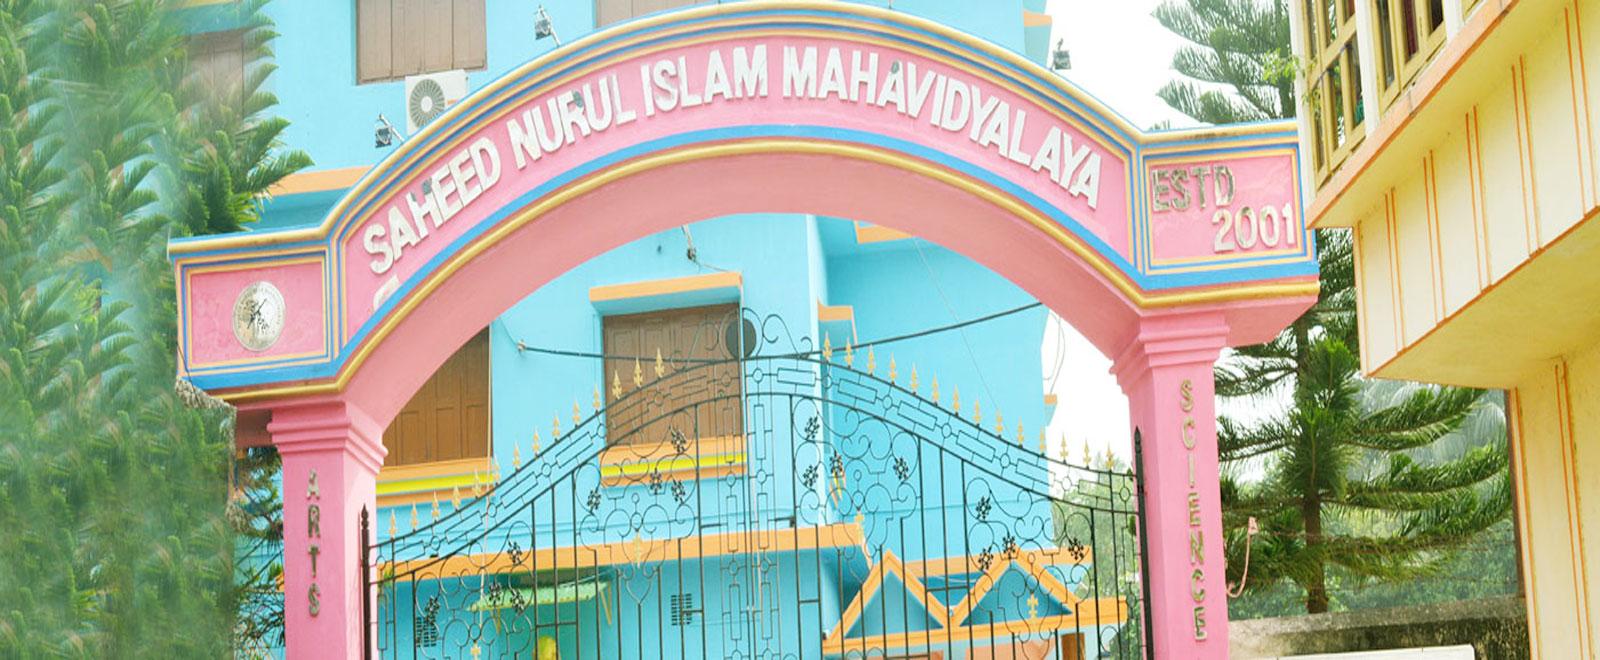 Saheed Nurul Islam Mahavidyalaya, 24 Parganas (n) Image